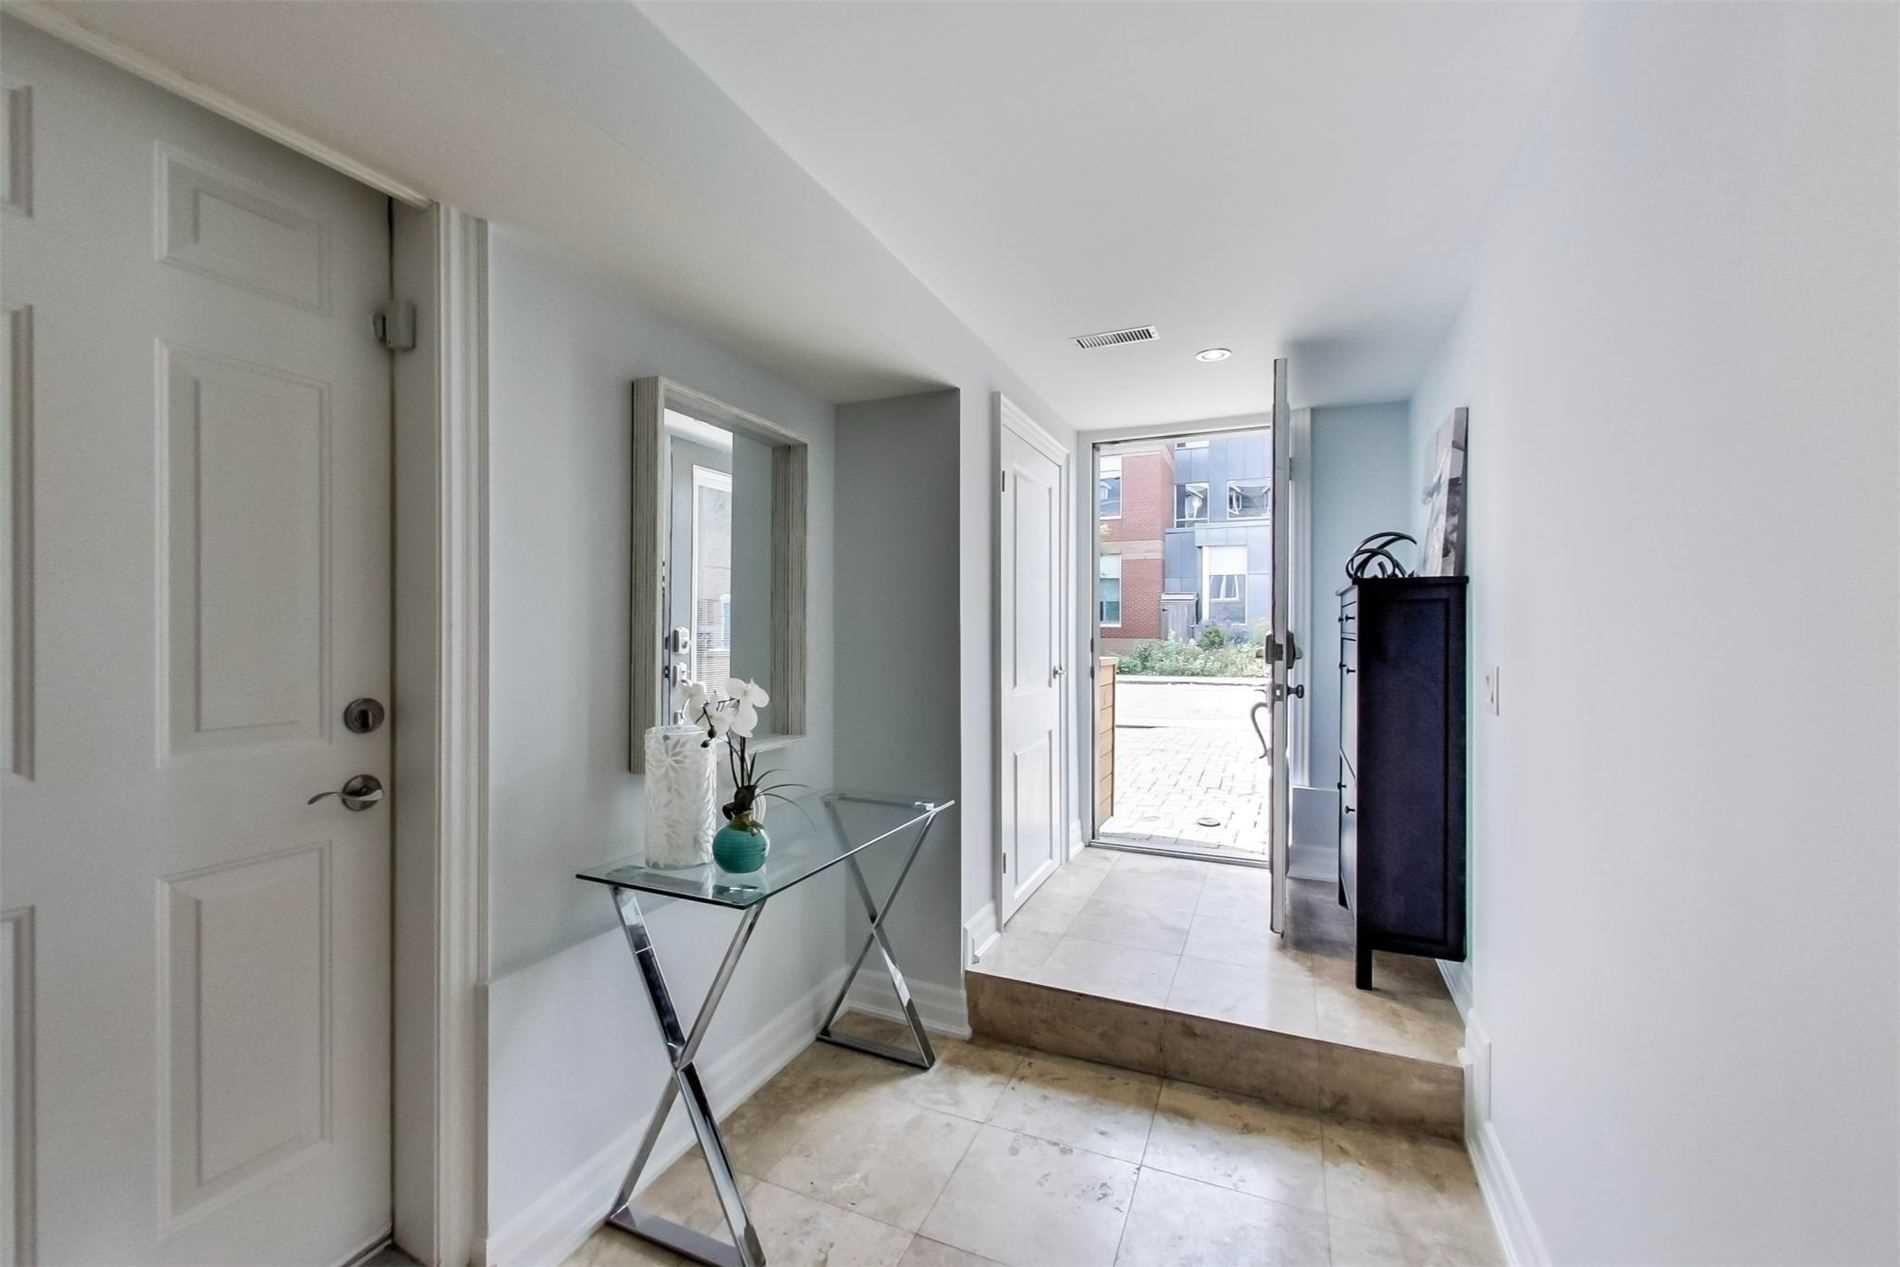 Photo 3: Photos: 213 Heward Avenue in Toronto: South Riverdale House (3-Storey) for sale (Toronto E01)  : MLS®# E4941877